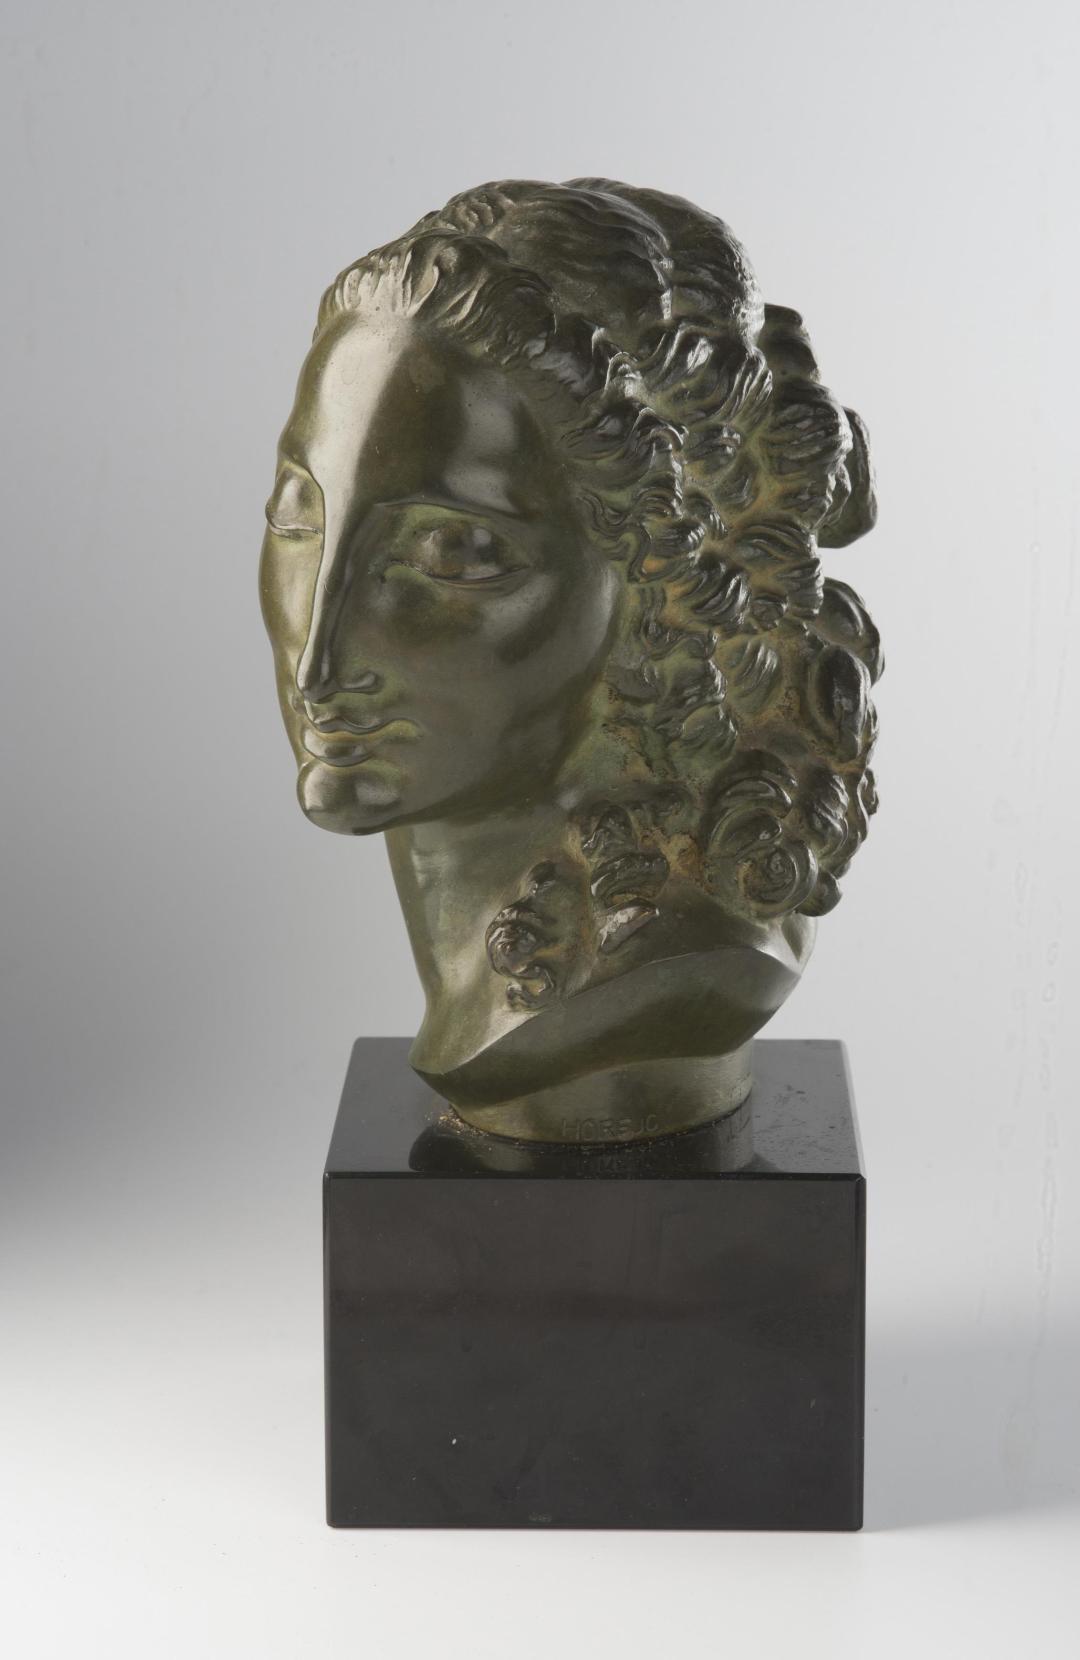 Livia, bronze, green patina, signed Horejc, height 18 cm, a black marble stand (Zí)